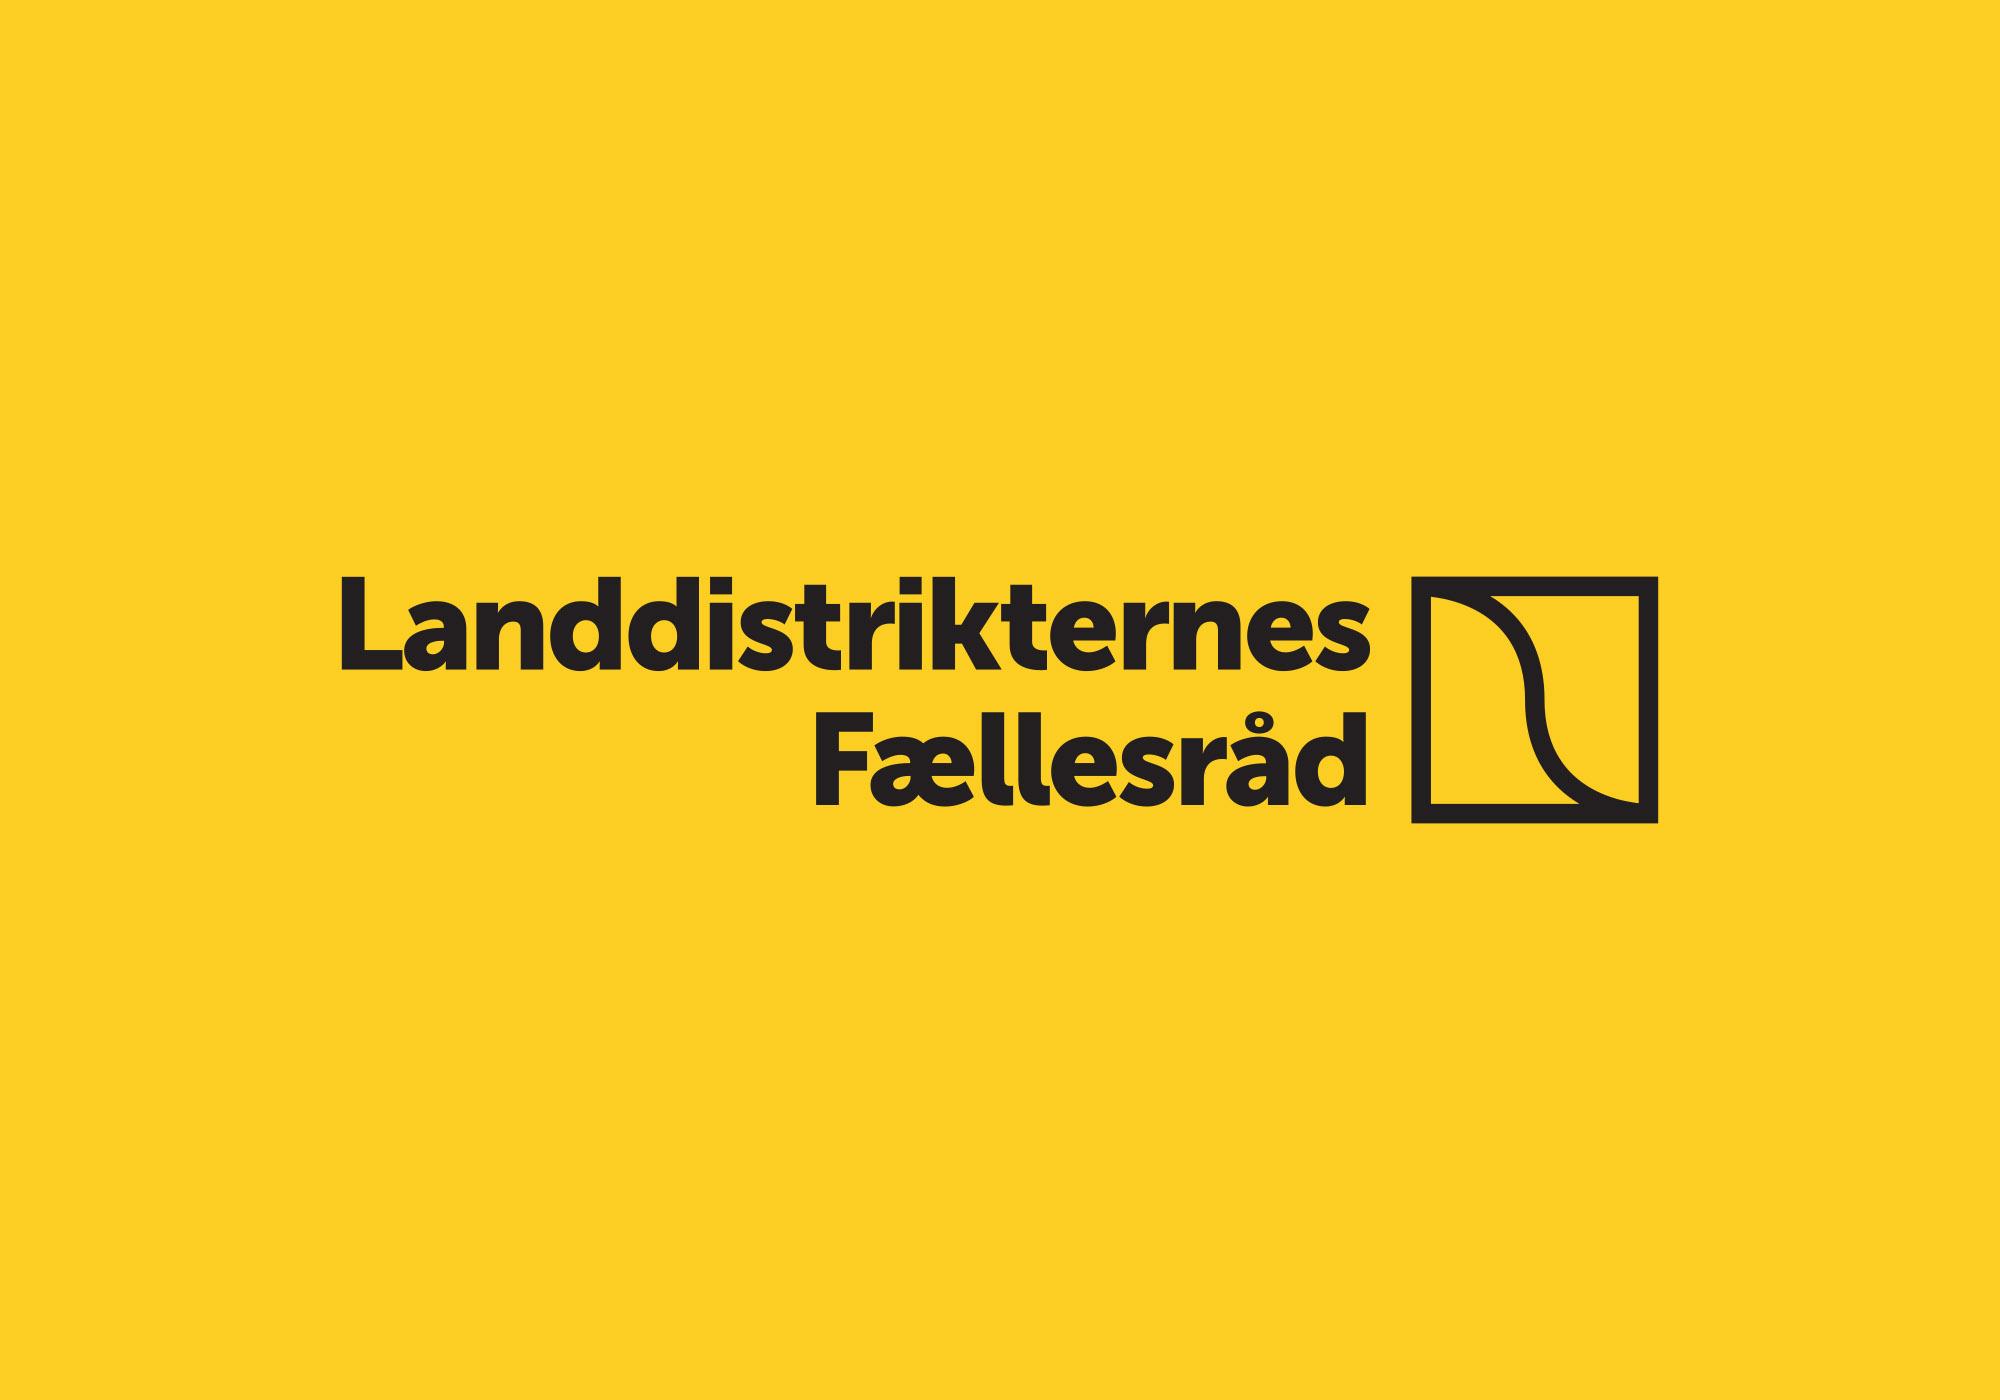 Landdistrikternes_faellesraad_0008_YCCA